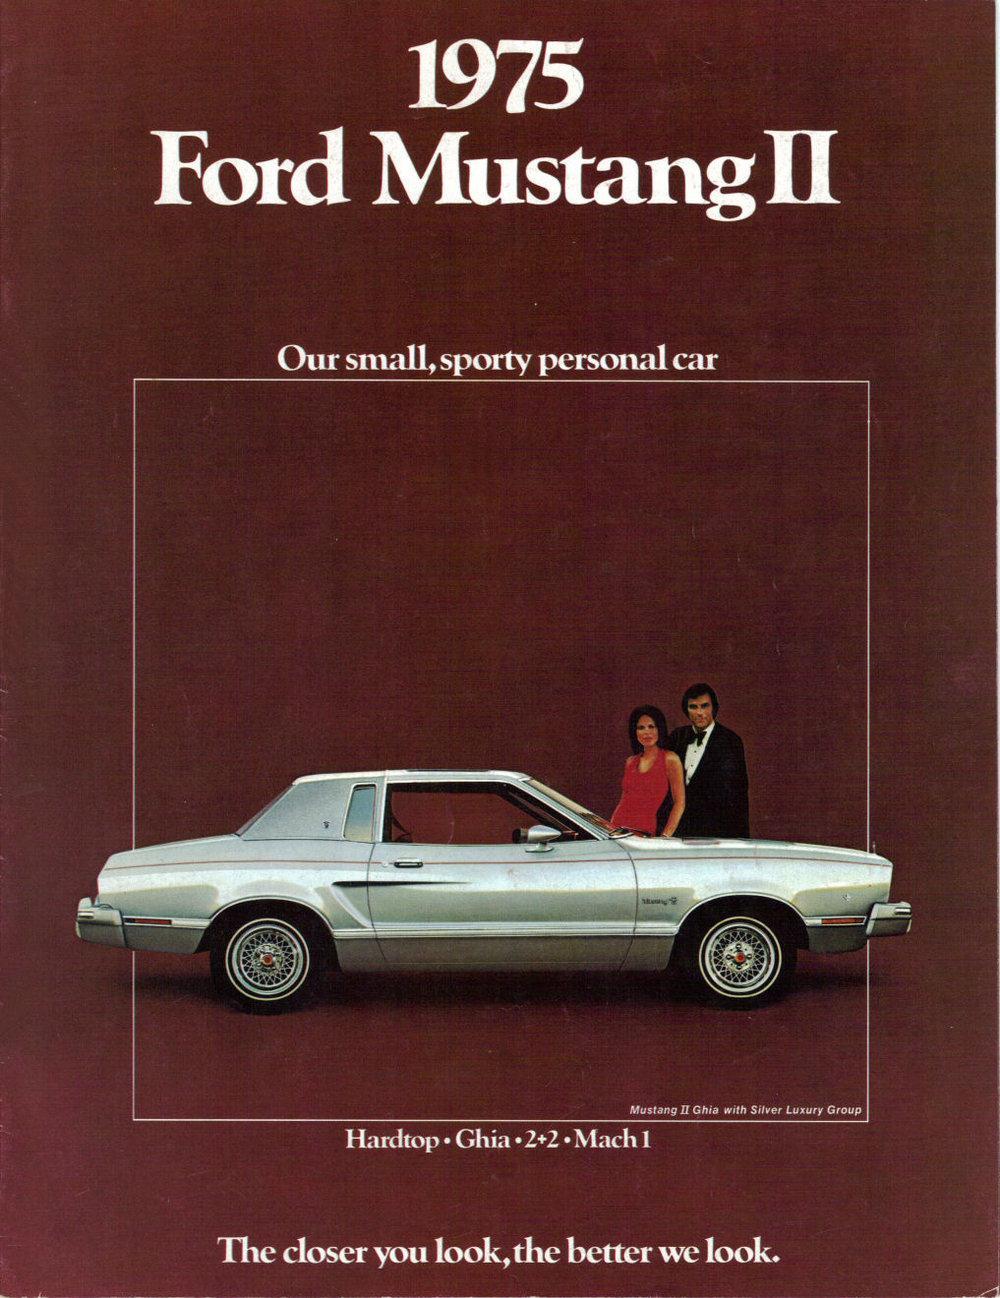 1975-ford-mustang-ii-print-ad.jpg